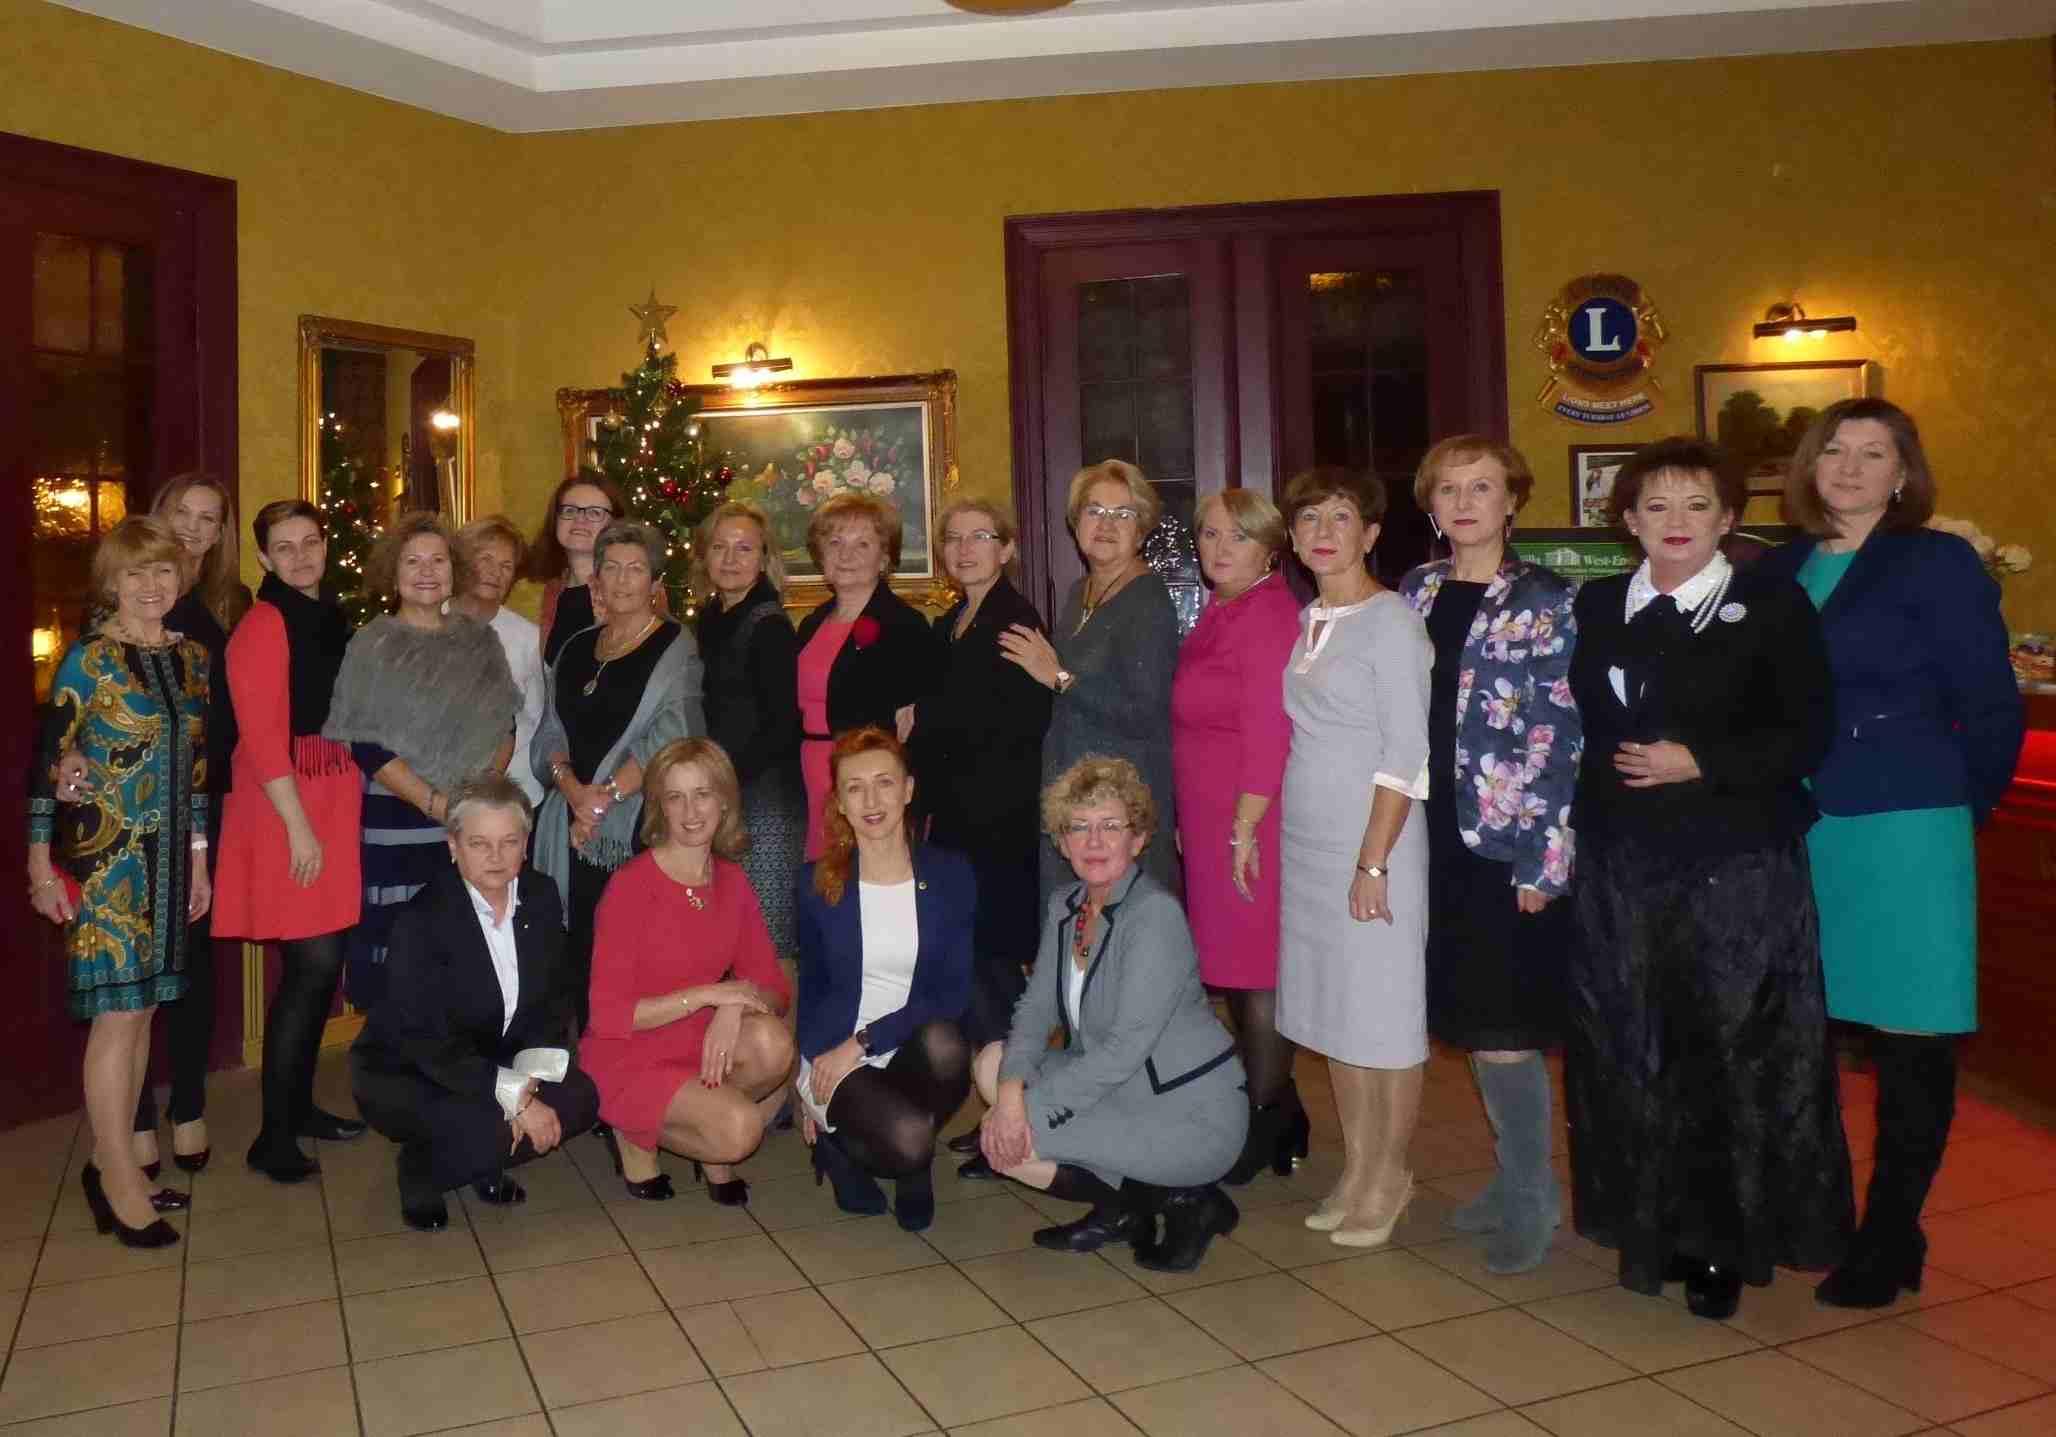 wigilia-jantarek-13-12-2016-r